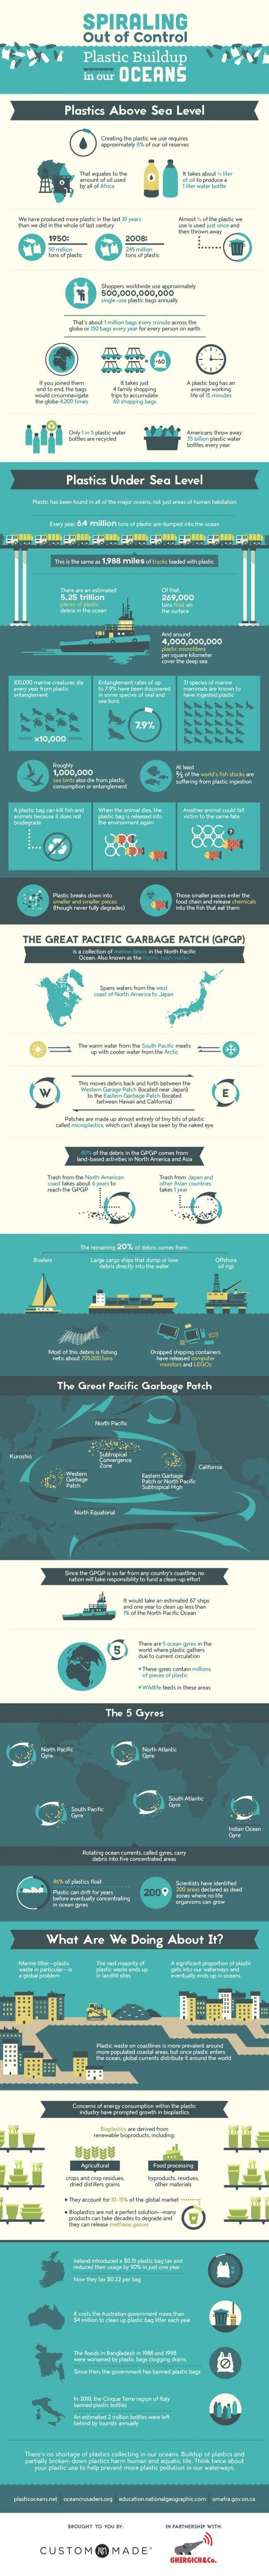 plastic buildup in oceans infographic